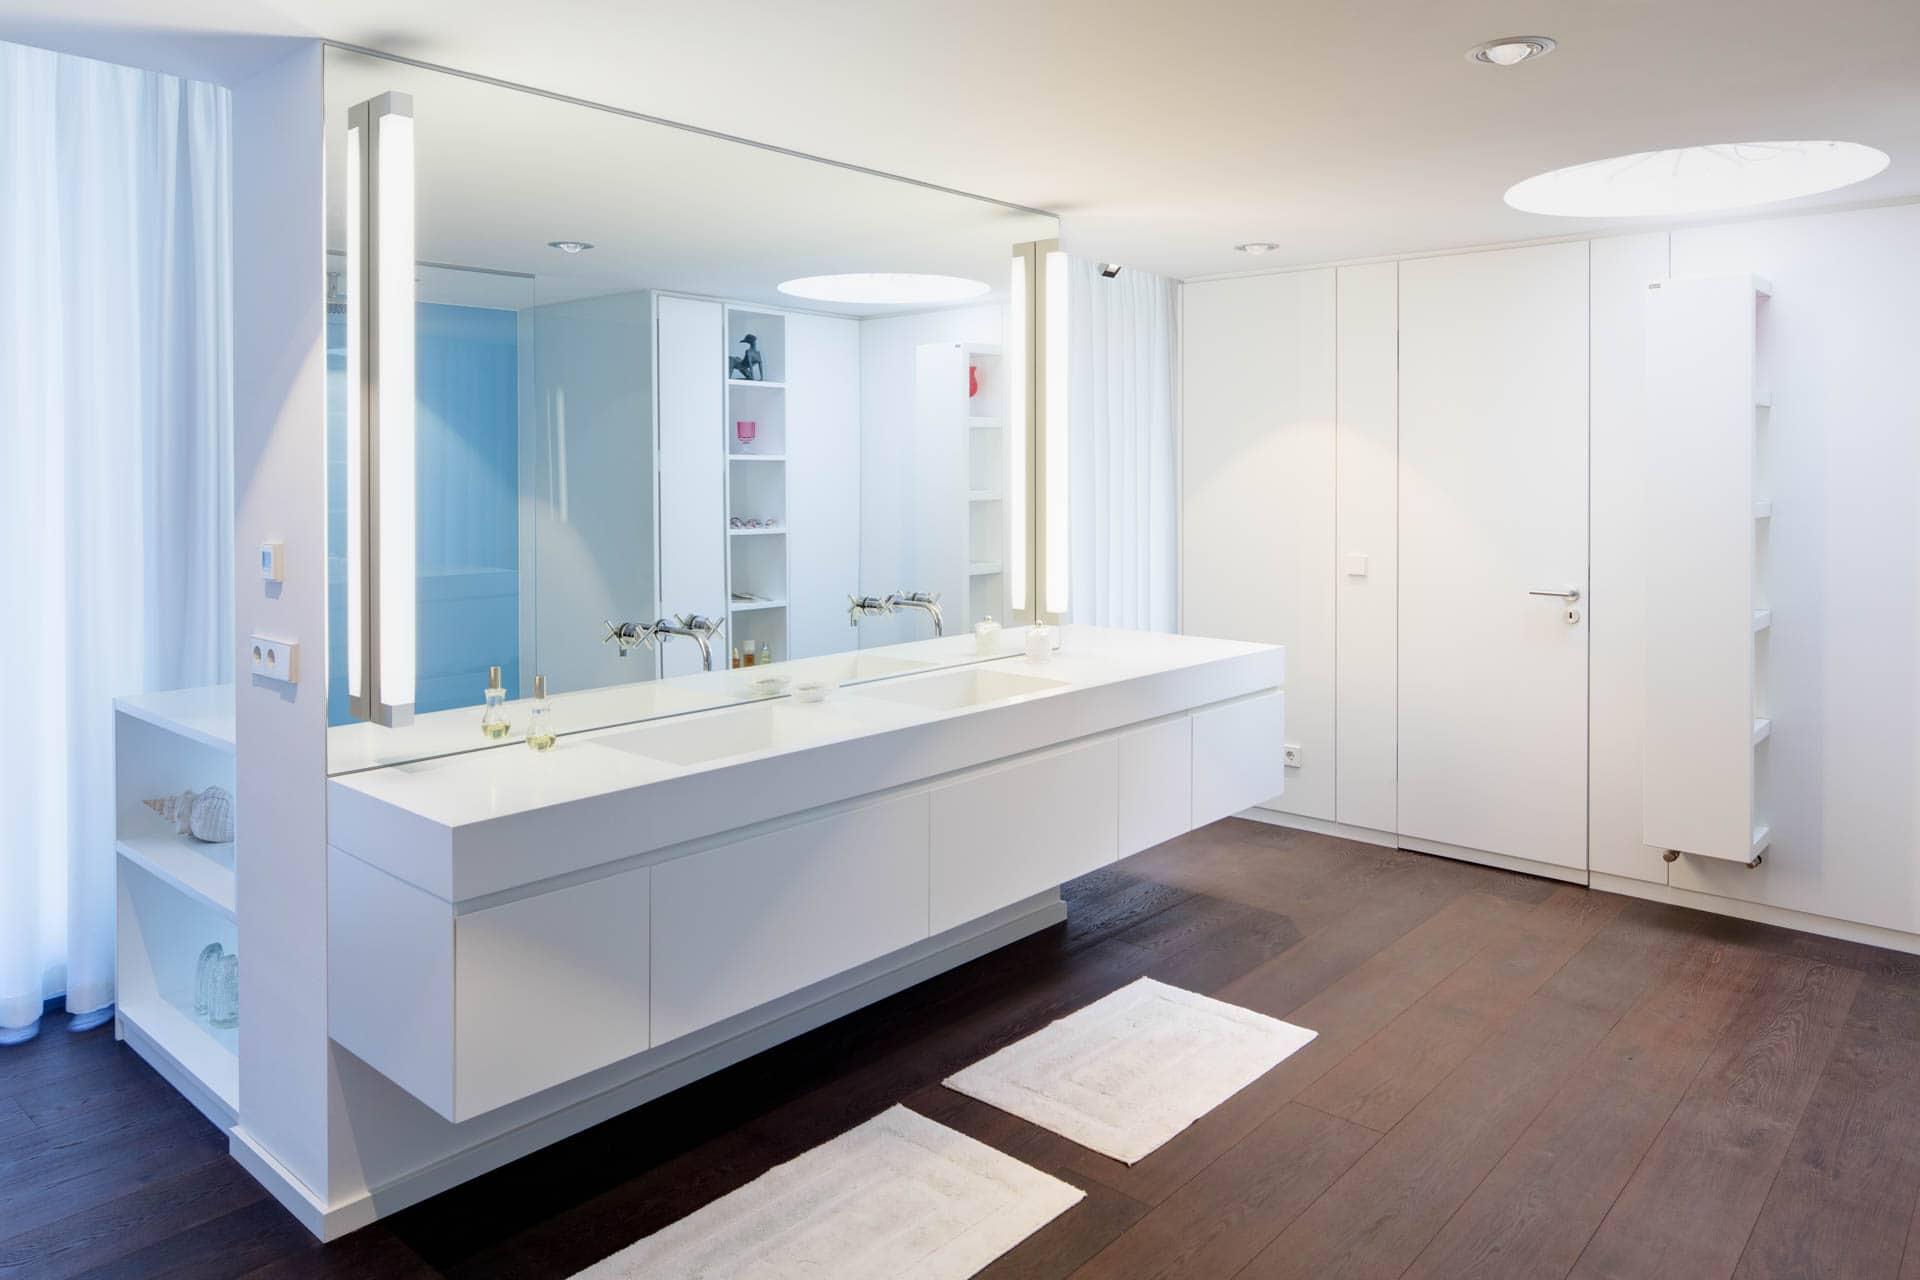 Penthouse-Wohnung, Viceversa Architektur